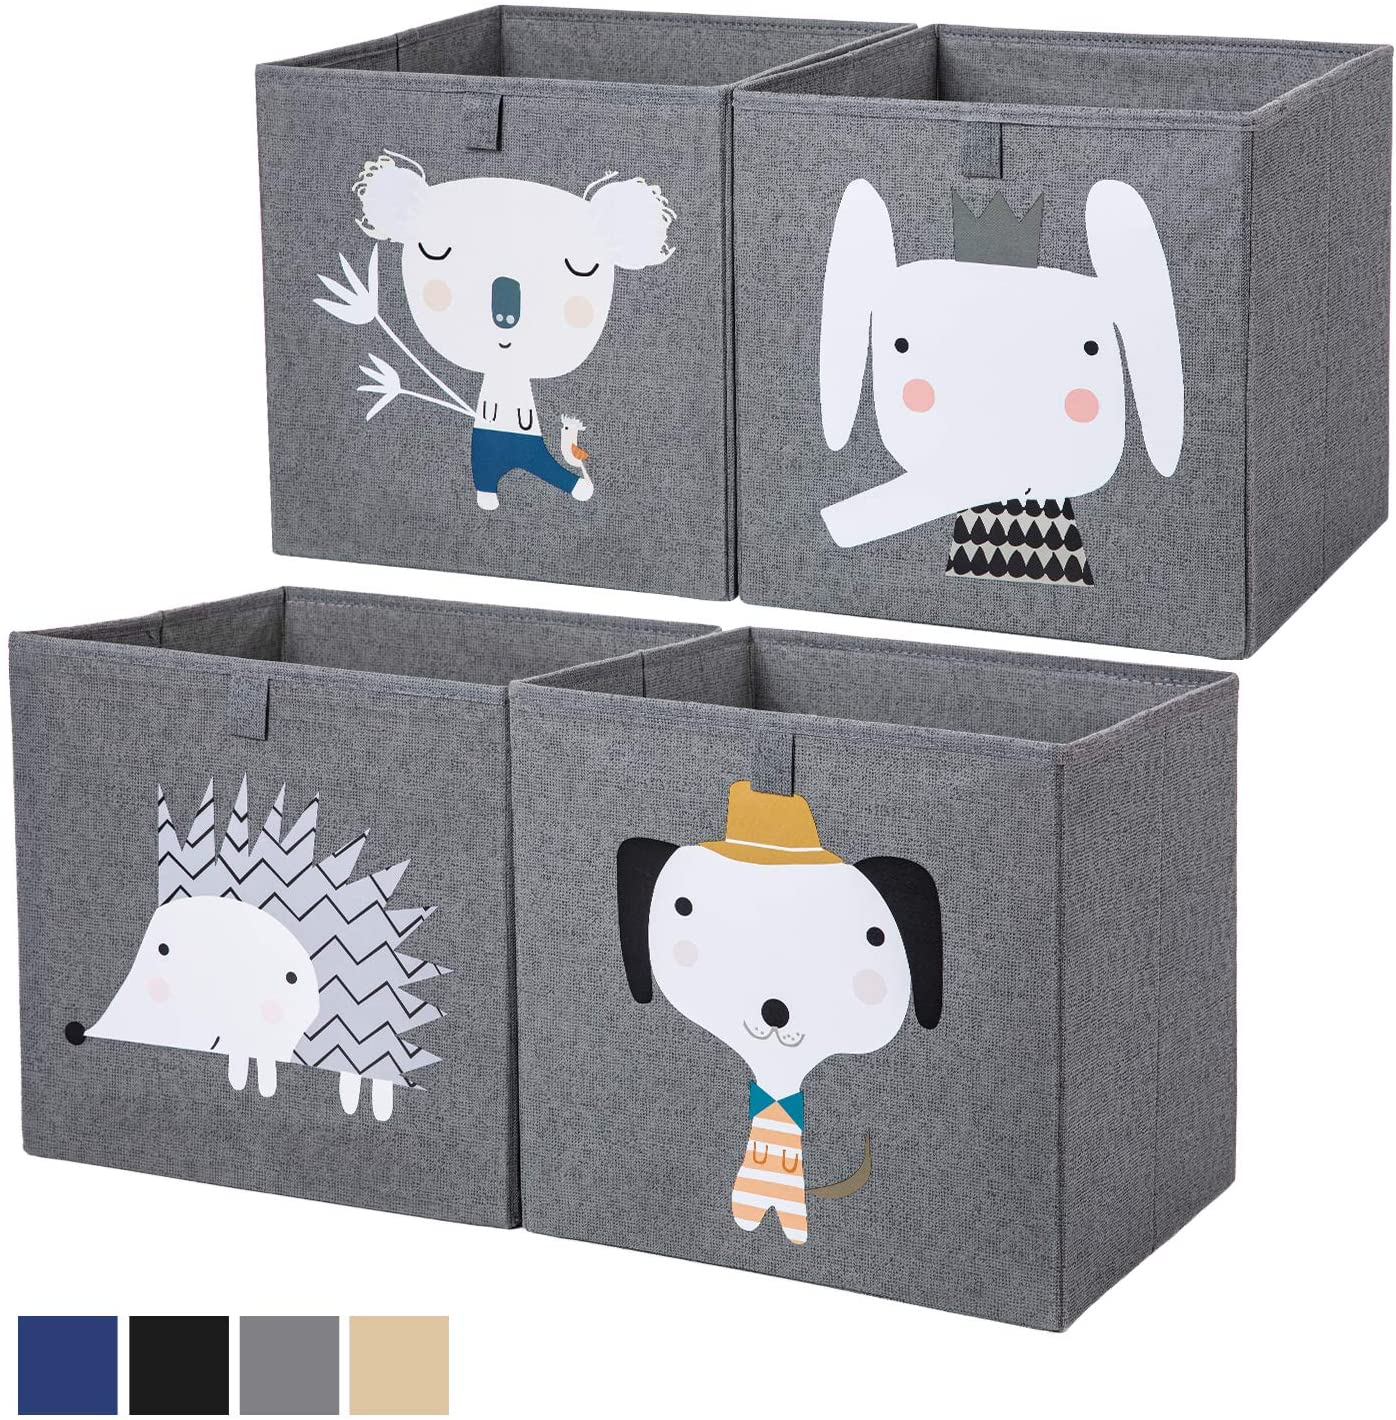 AXHOP Storage Bins Storage Cubes, 13 ×13 Foldable Fabric Storage Containers Organizer for Kids, Toddlers, Office, Closet, Shelf, 4-Pack(Dark Grey Elephant)